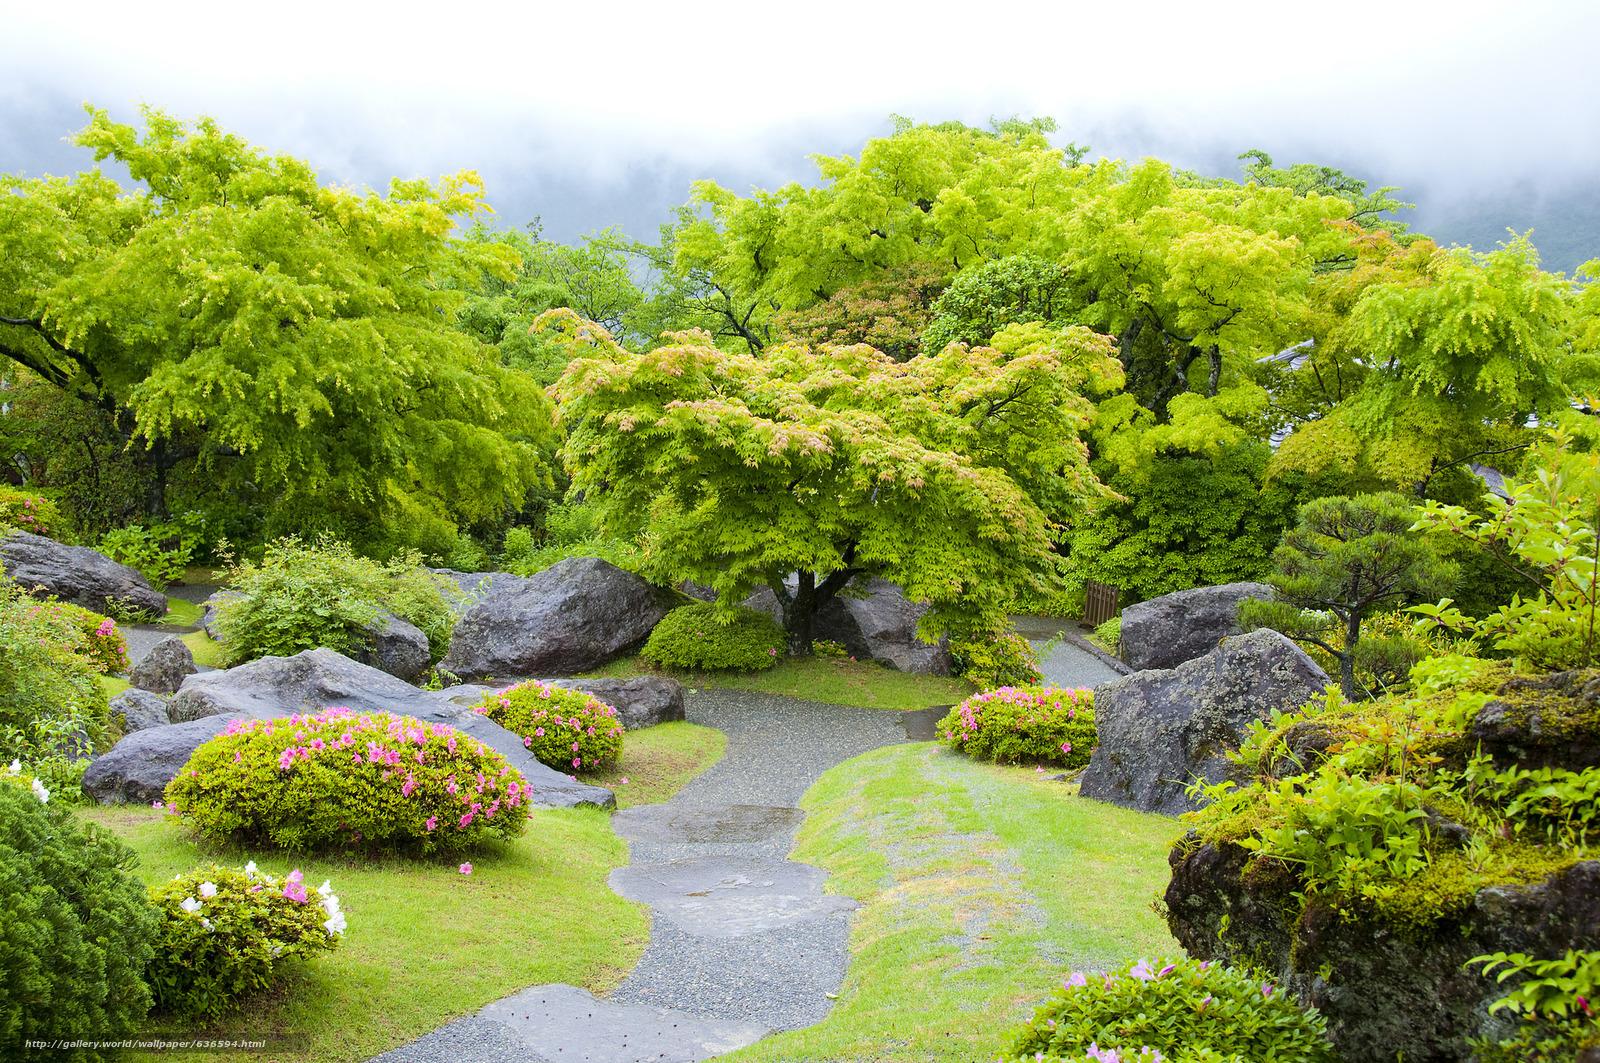 Tlcharger fond d 39 ecran jardin japonais jardin parc for Jardin japonais fond d ecran